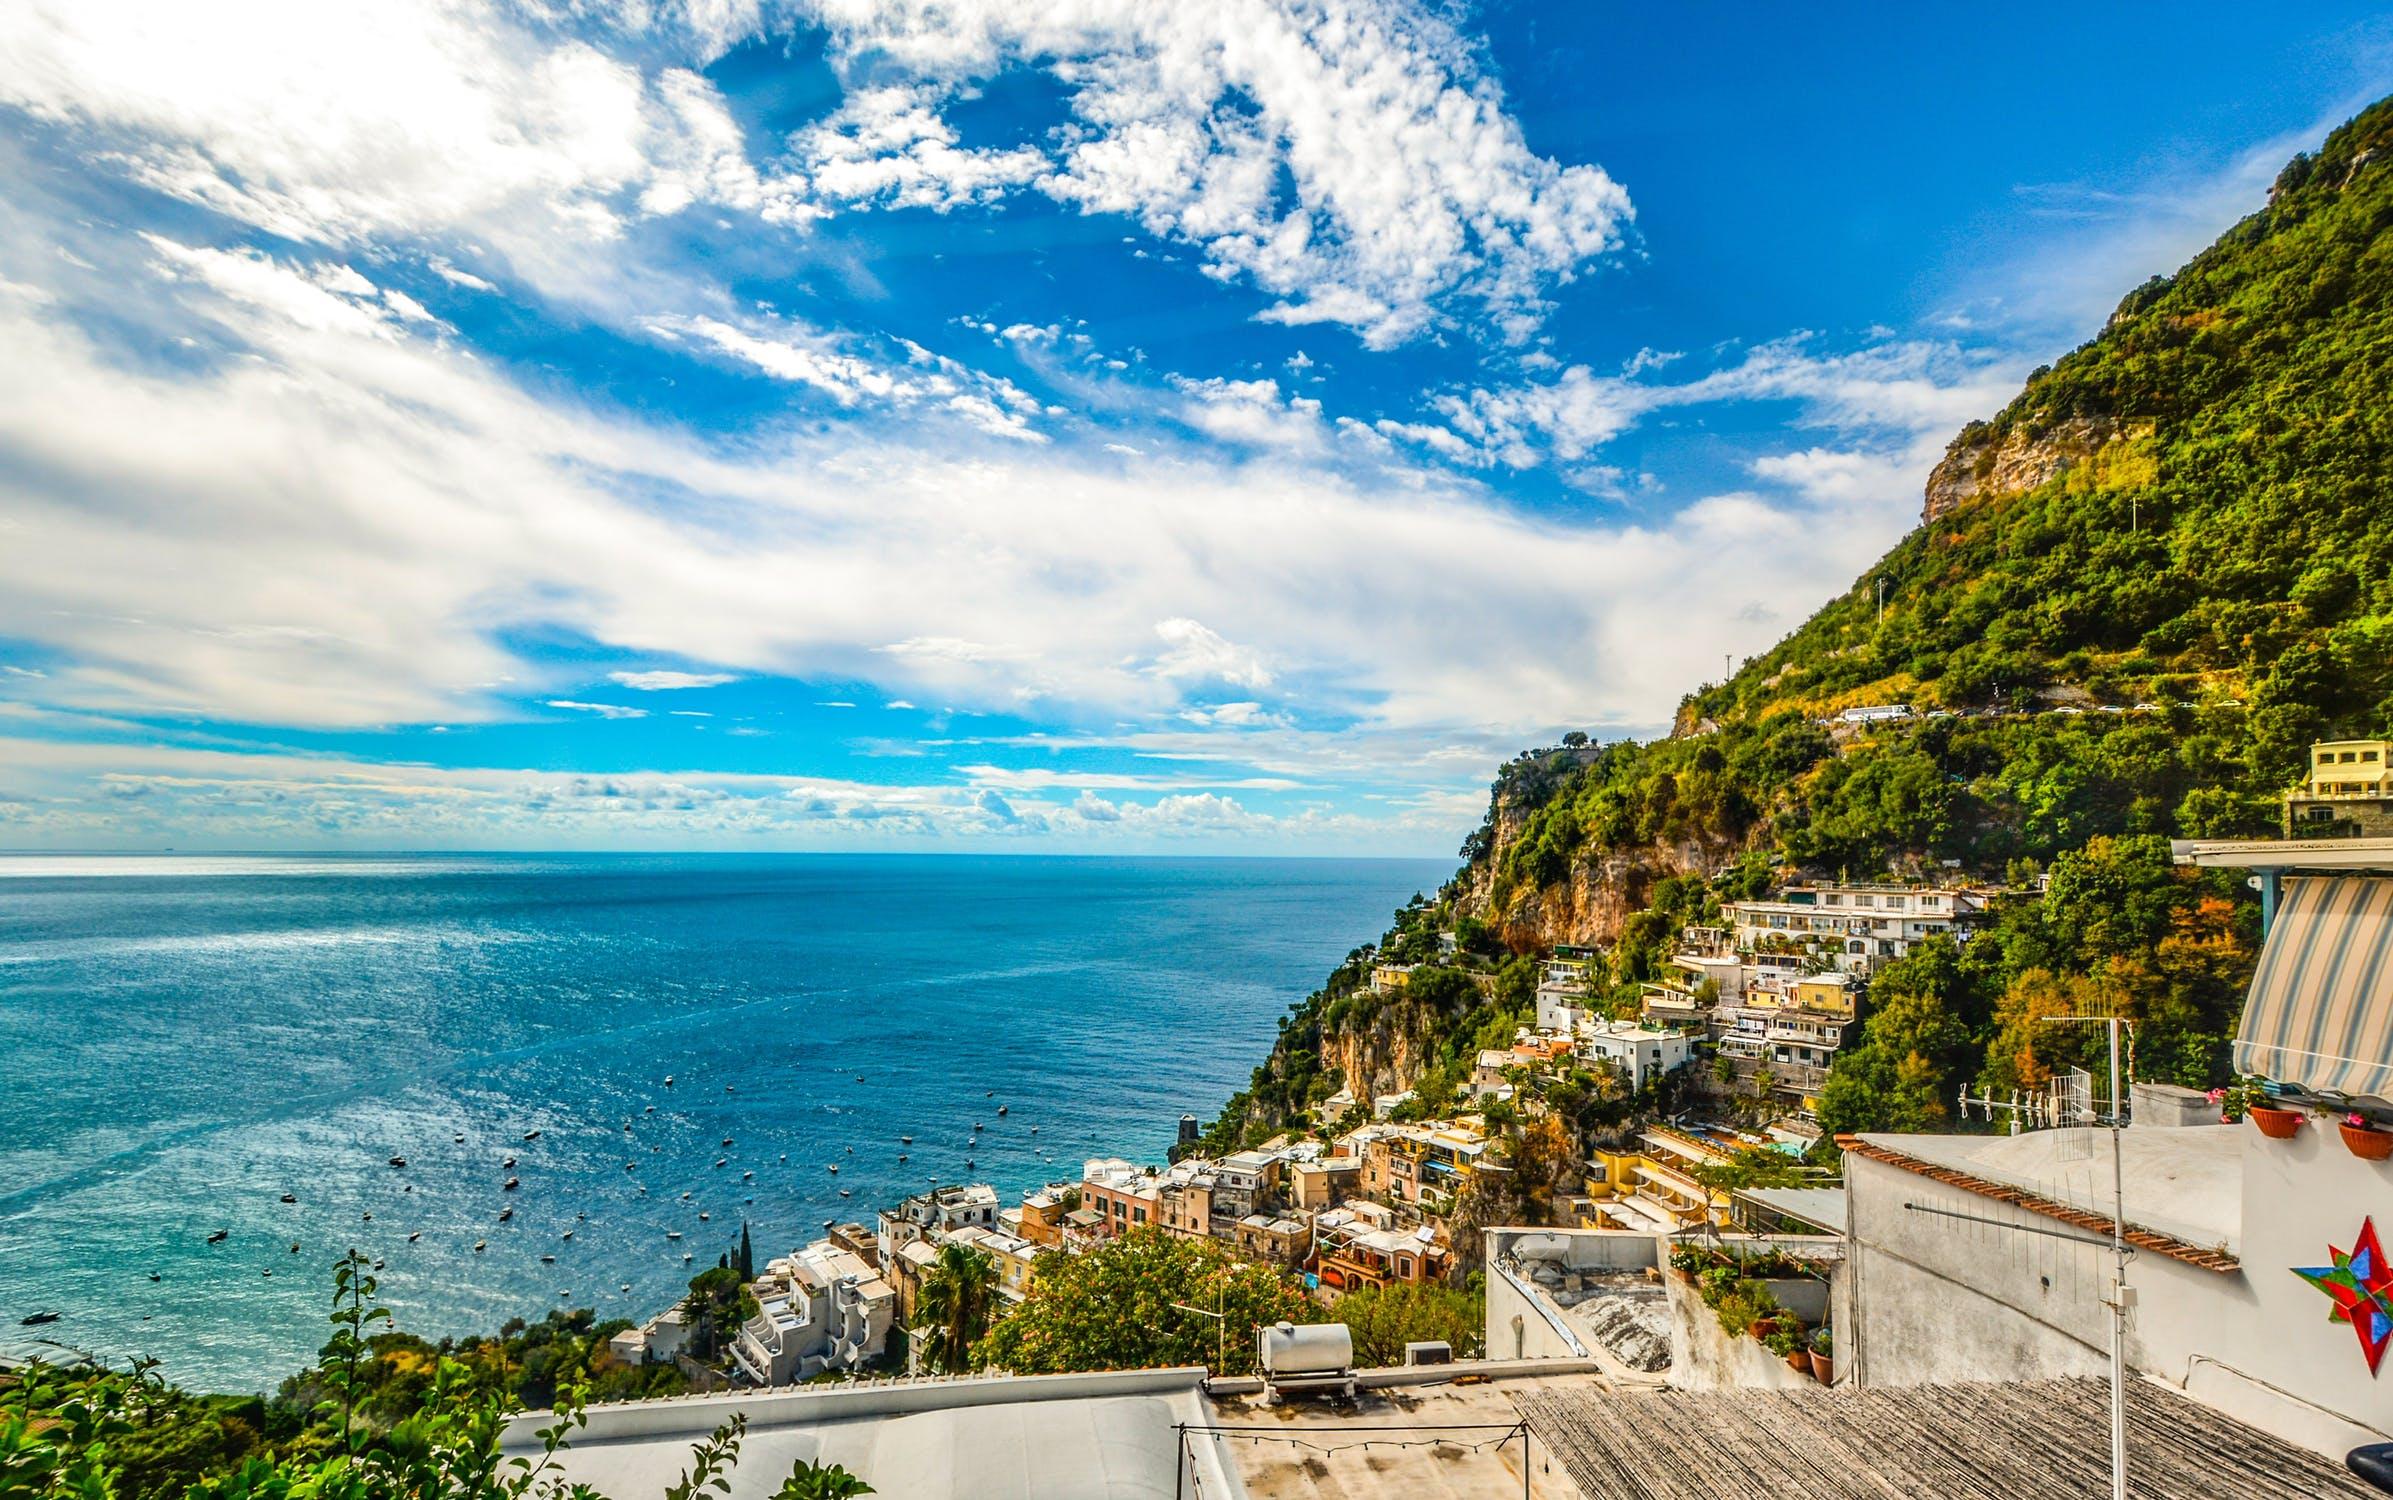 amalfi-amalfi-coast-architecture-bay